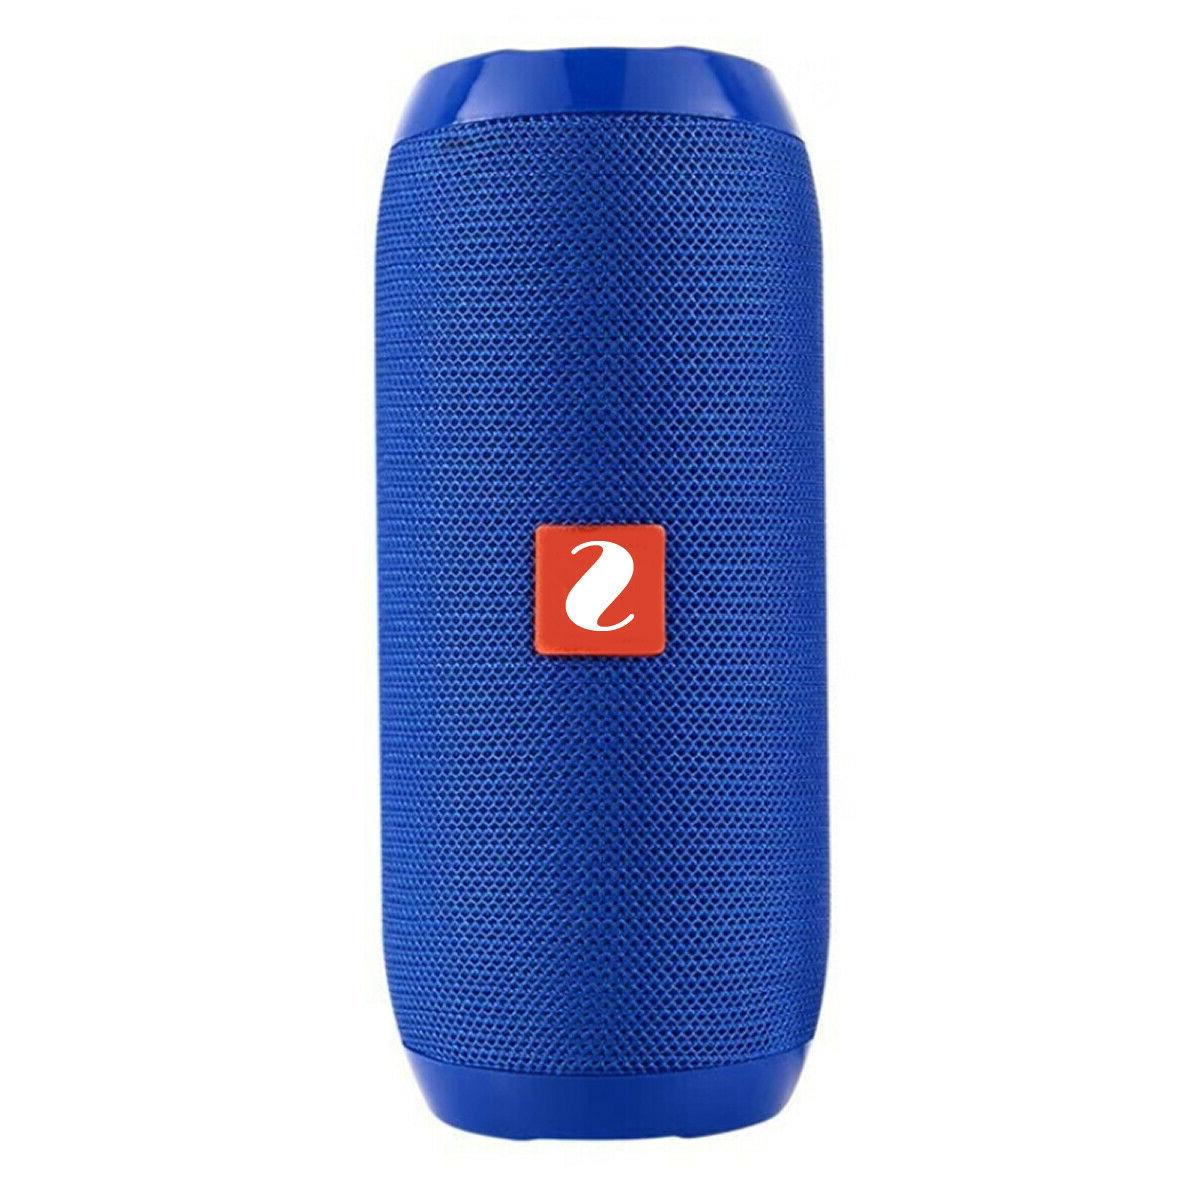 LOUD Bluetooth Waterproof Outdoor Stereo USB/TF/MP3